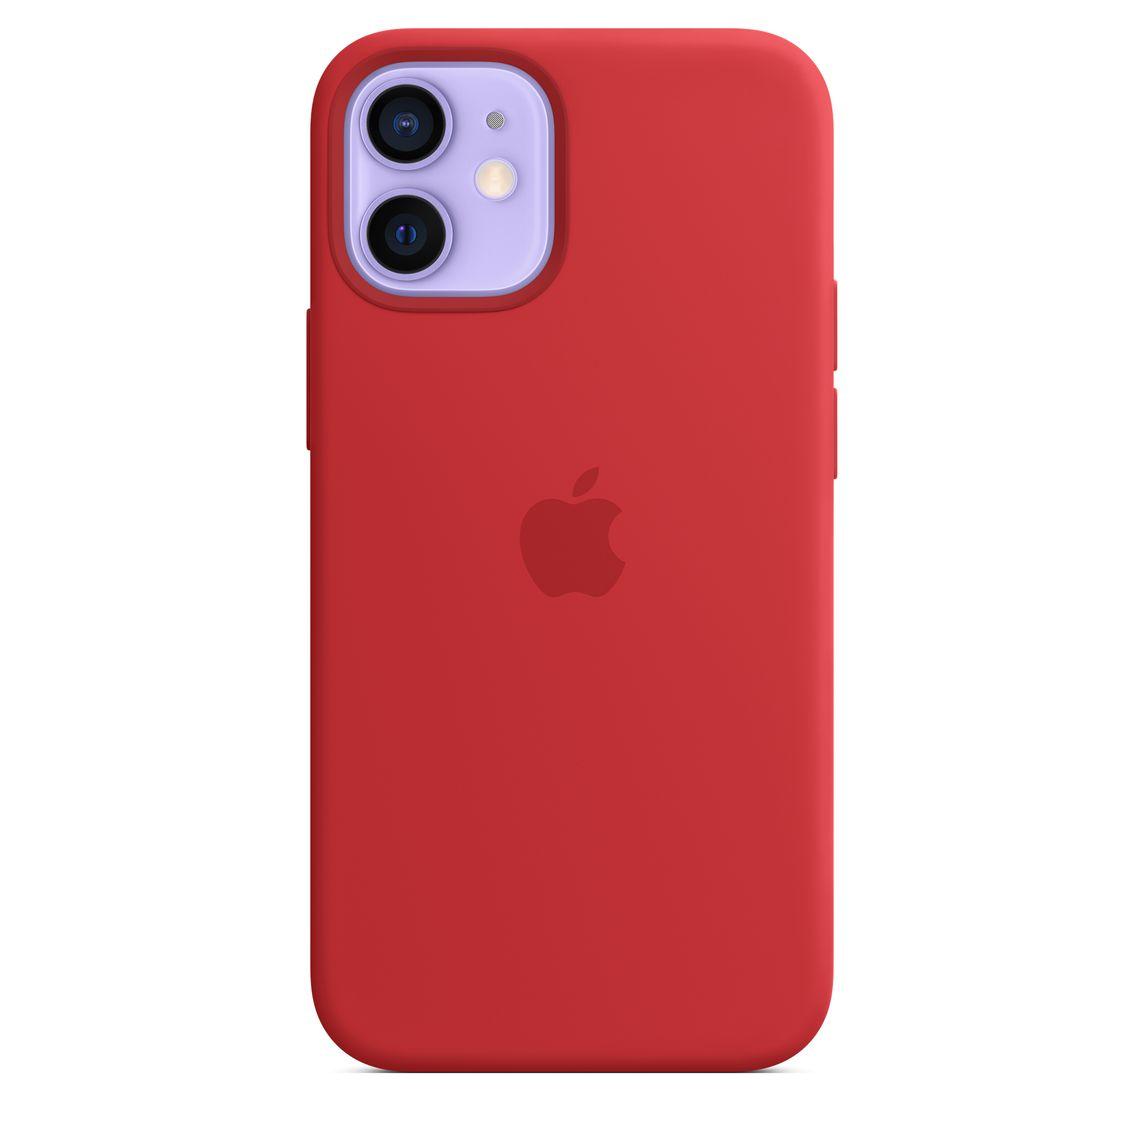 Custodia MagSafe in silicone per iPhone 12 mini - Rosso (PRODUCT)RED